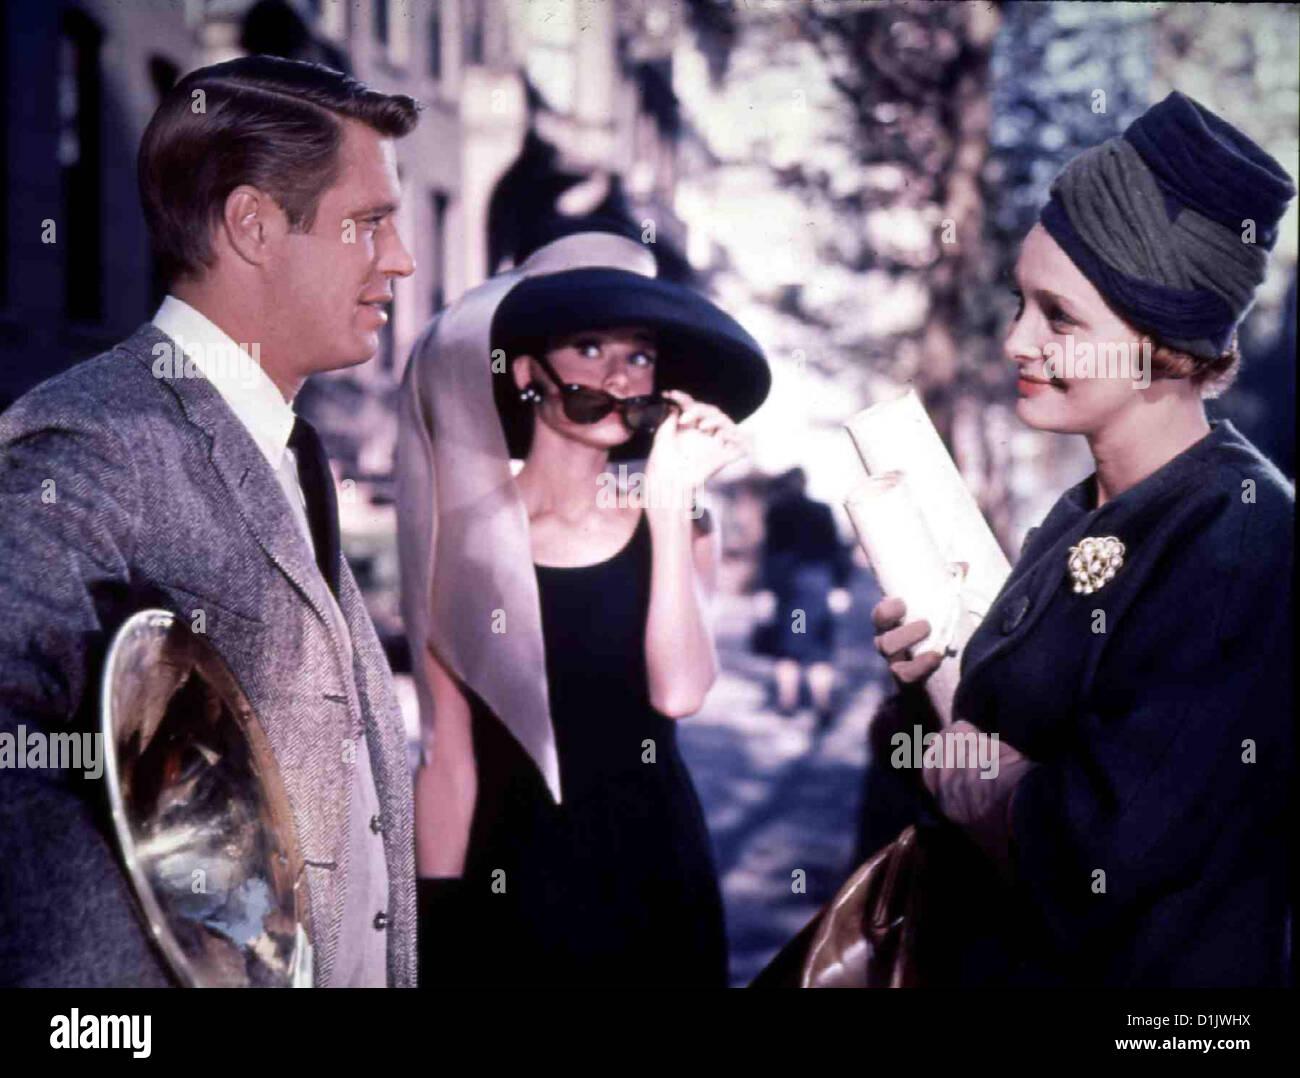 Fruehstueck Bei Tiffany   Breakfast At Tiffany's   George Peppard, Audrey Hepburn *** Local Caption *** 1961 - Stock Image